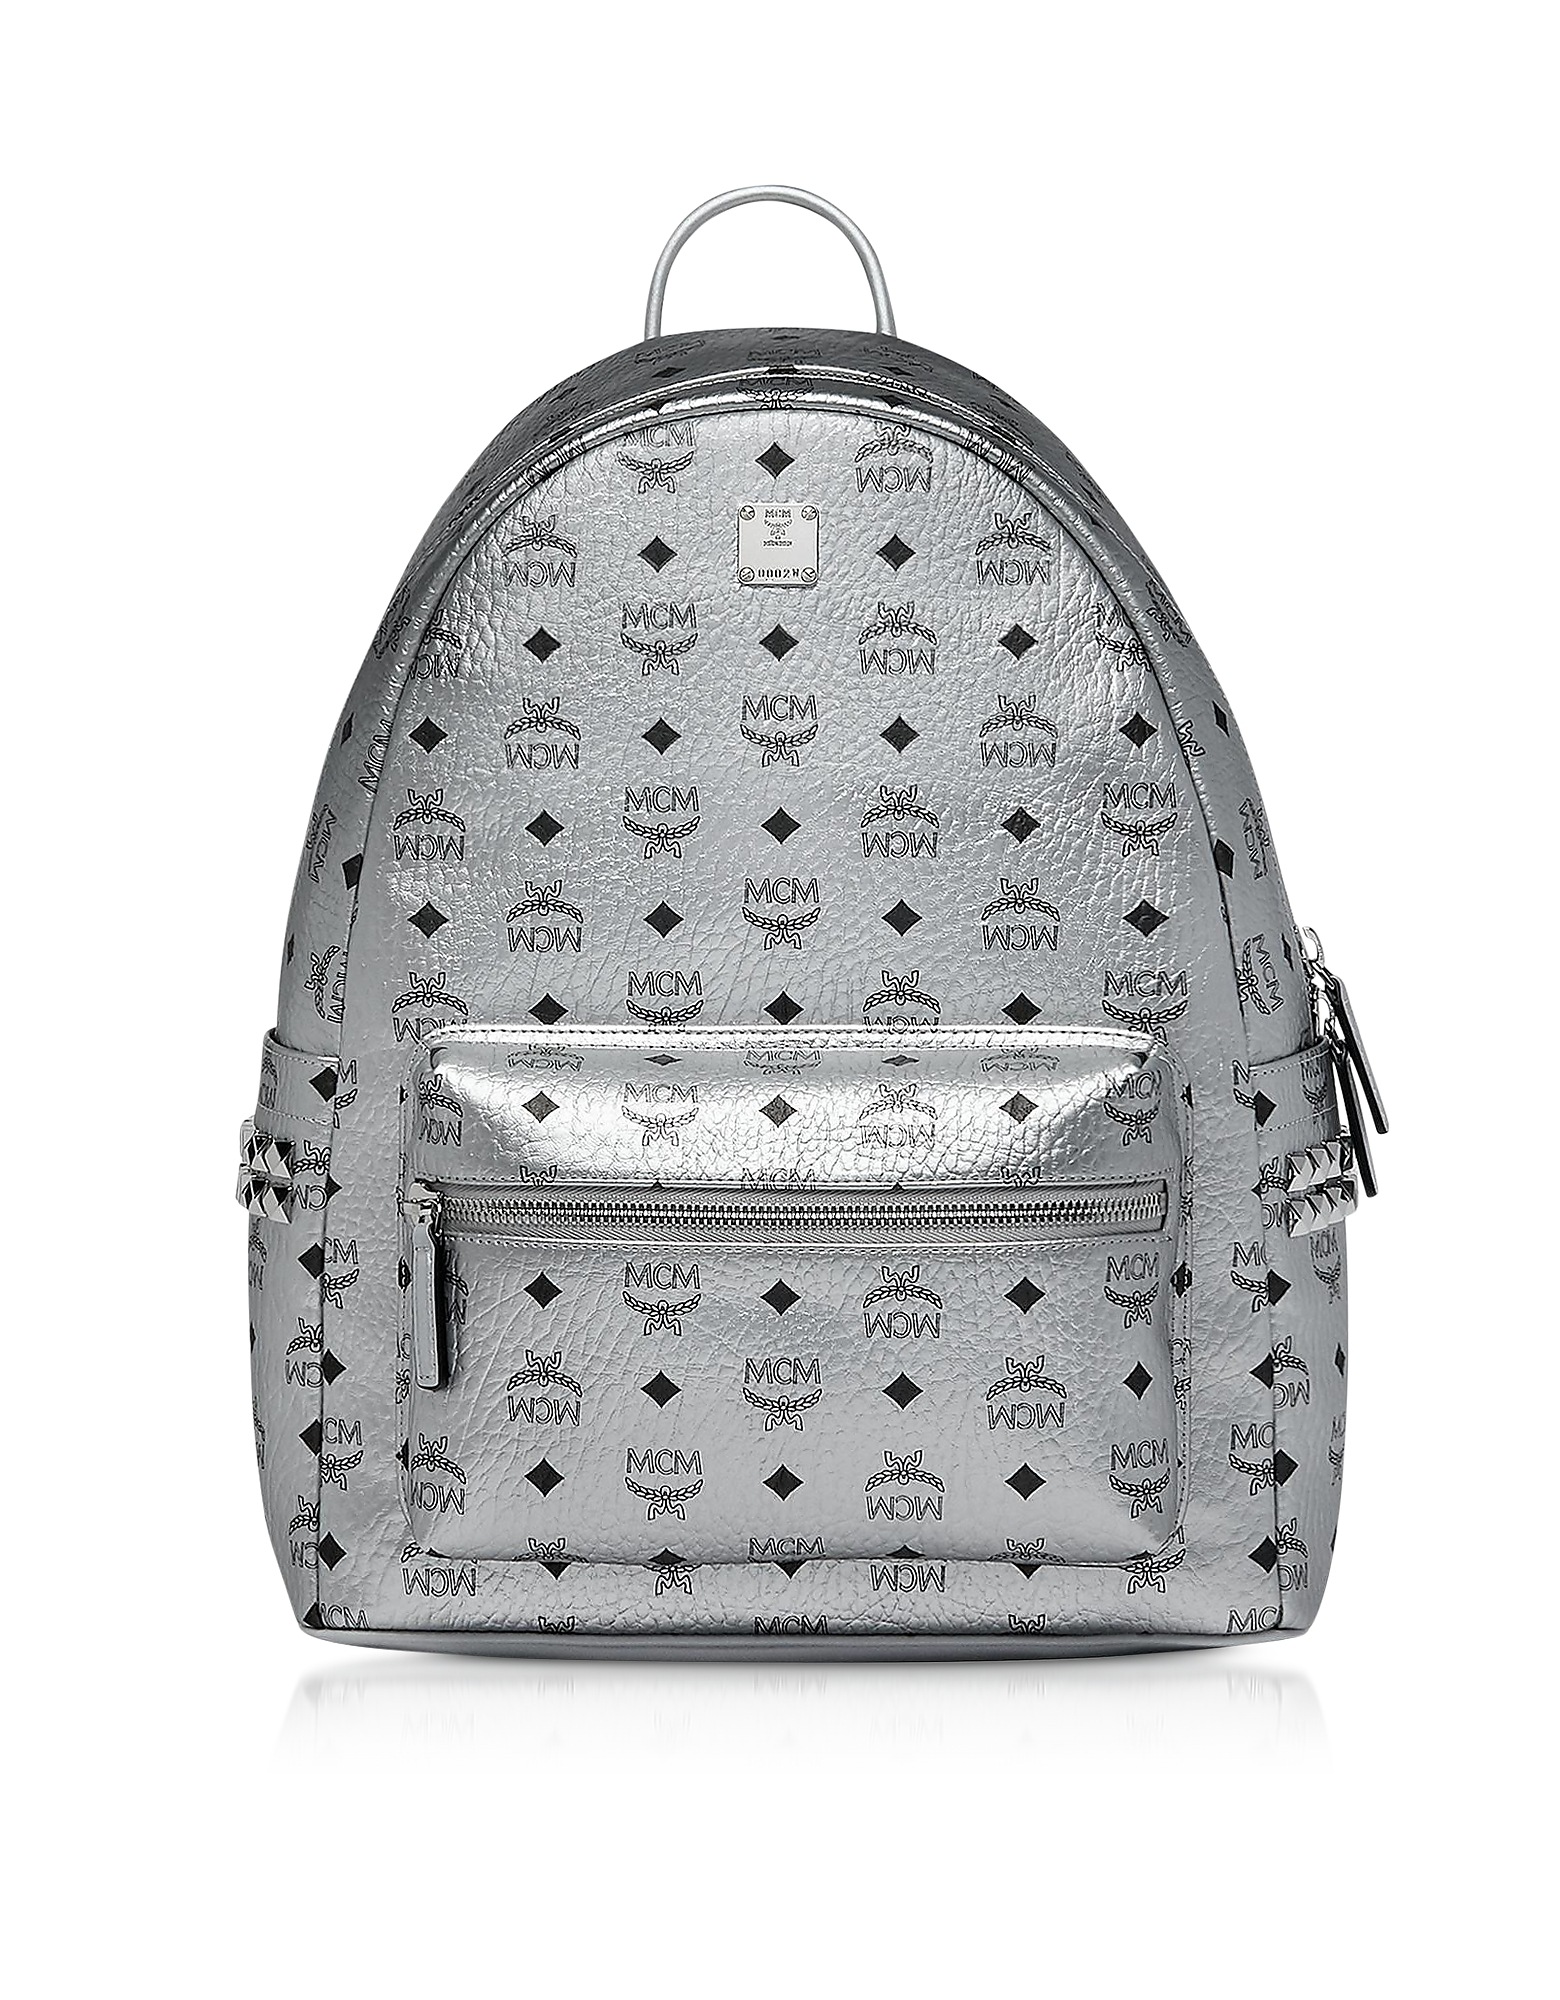 0260c8a45eaa8 Mcm Berlin Silver Side Studs Visetos Stark Backpack 40 | ModeSens